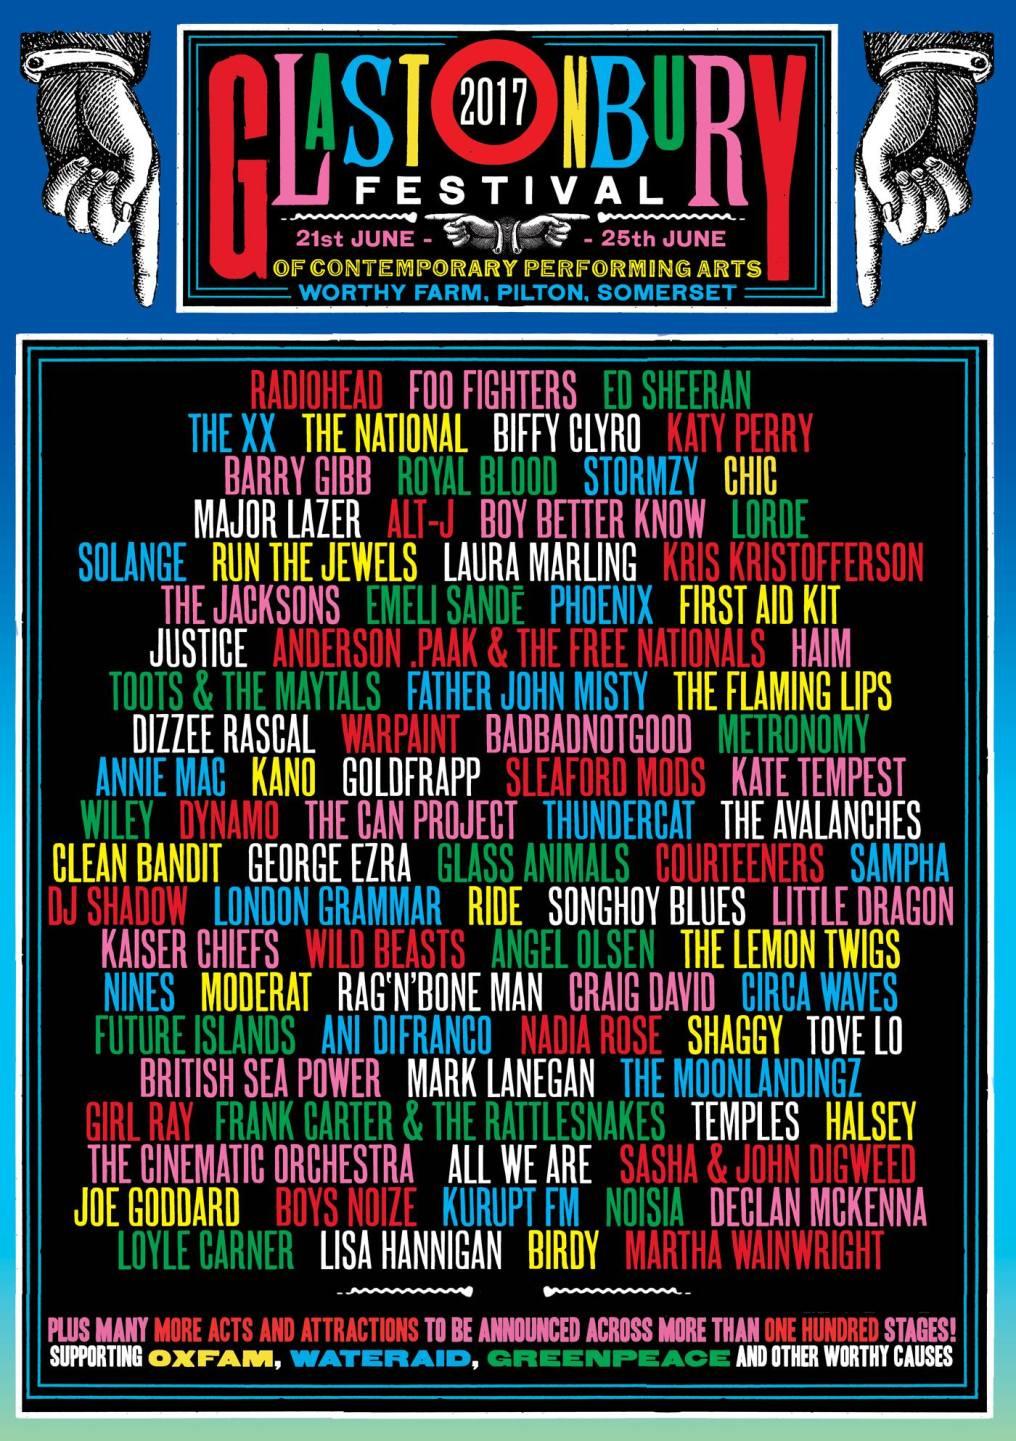 Glastonbury 2017 line-up poster